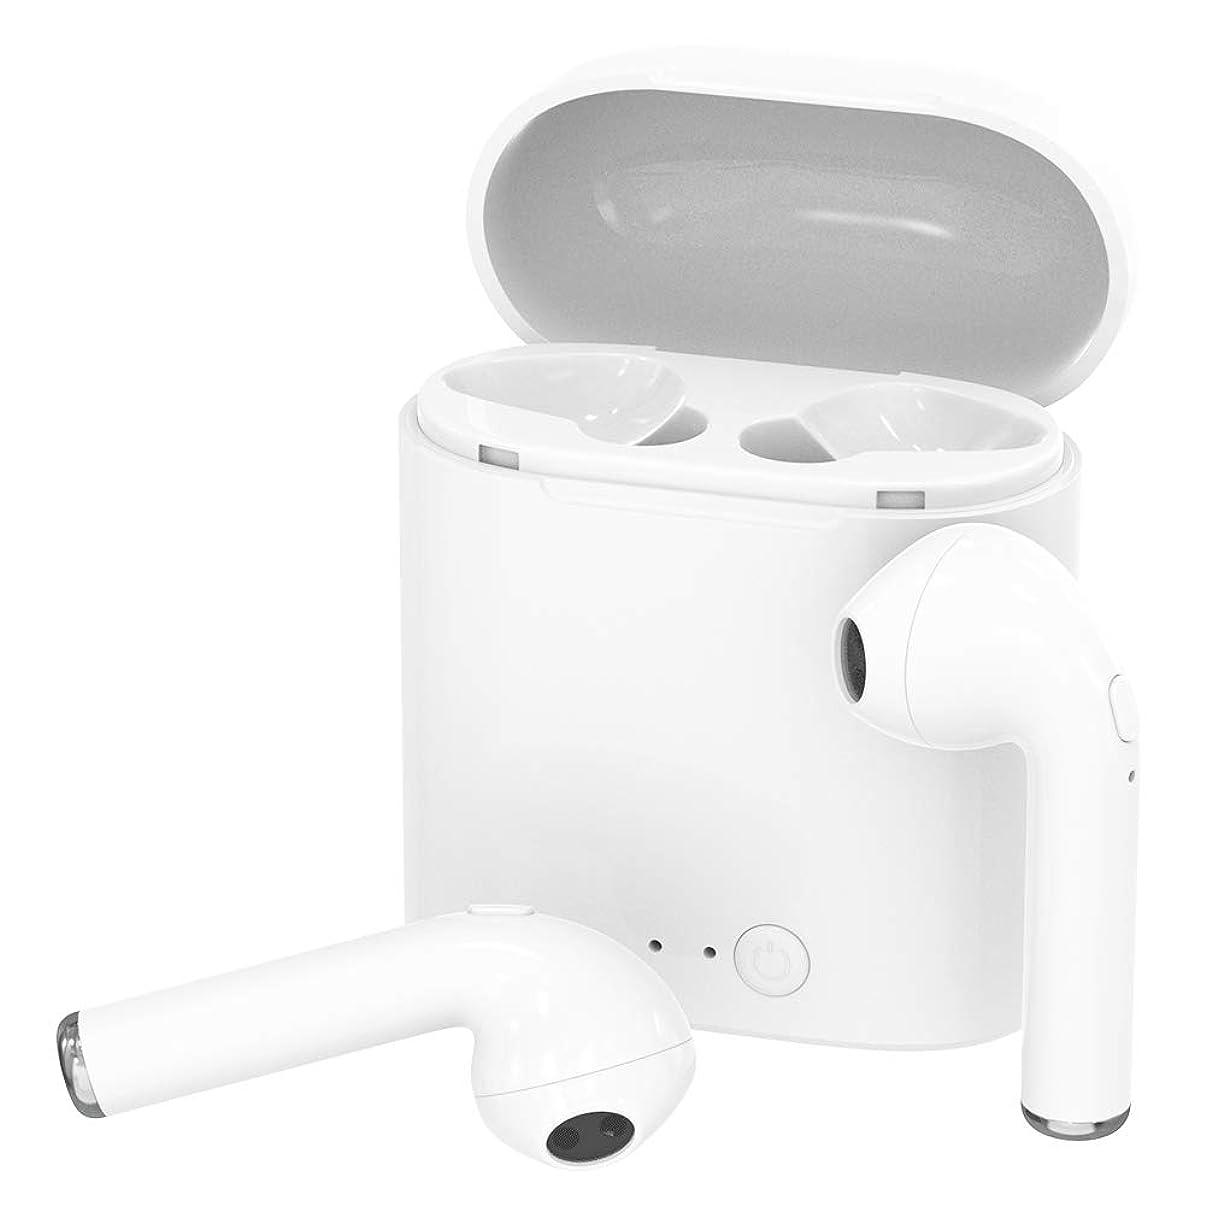 MIYAY-Wireless Headphones-Bluetooth Headphones - Noise Cancelling Sweat Proof Earphones- Wireless Earbuds - Running Headphones for Women Men - Made Compatible for All Smart Phones